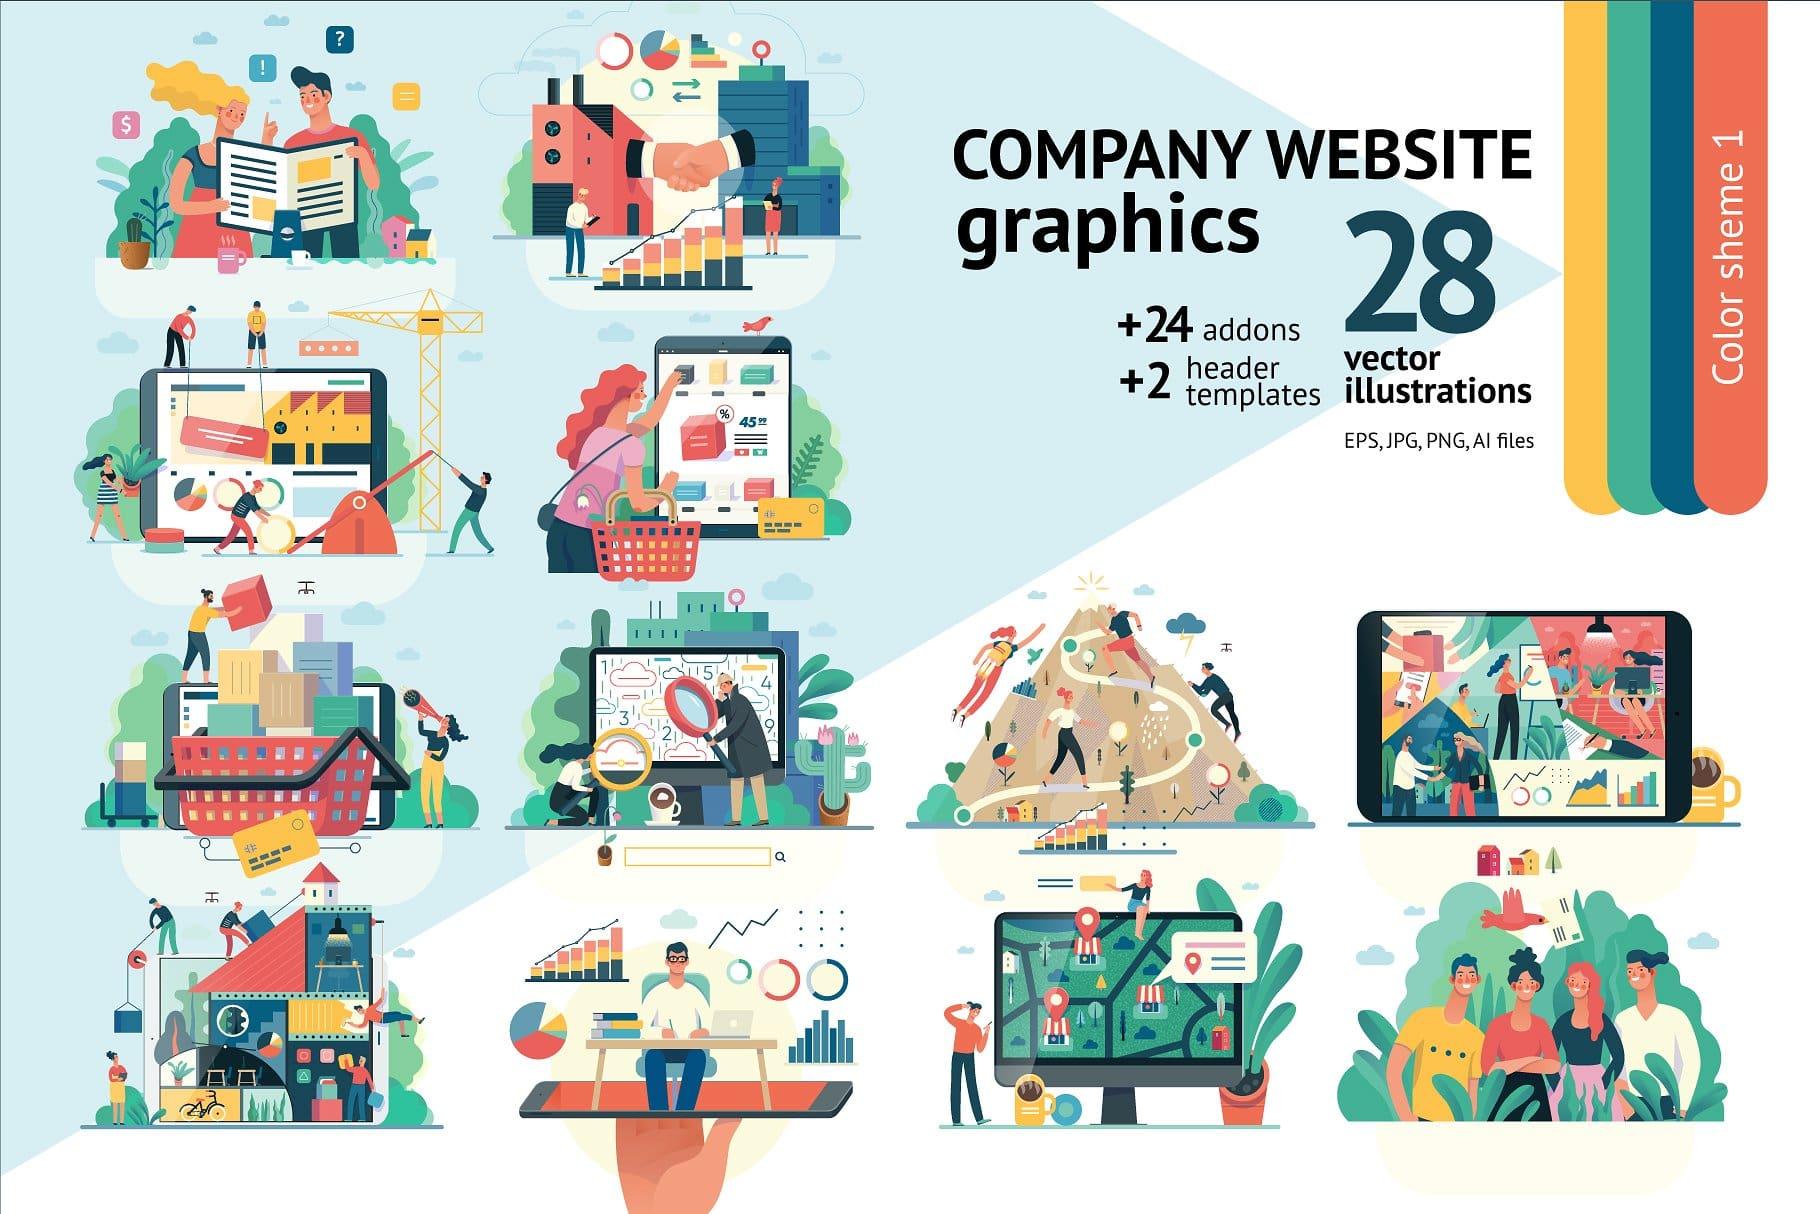 10 Premium Vector Graphics from CreativeMarket.com - Feb 2019 5